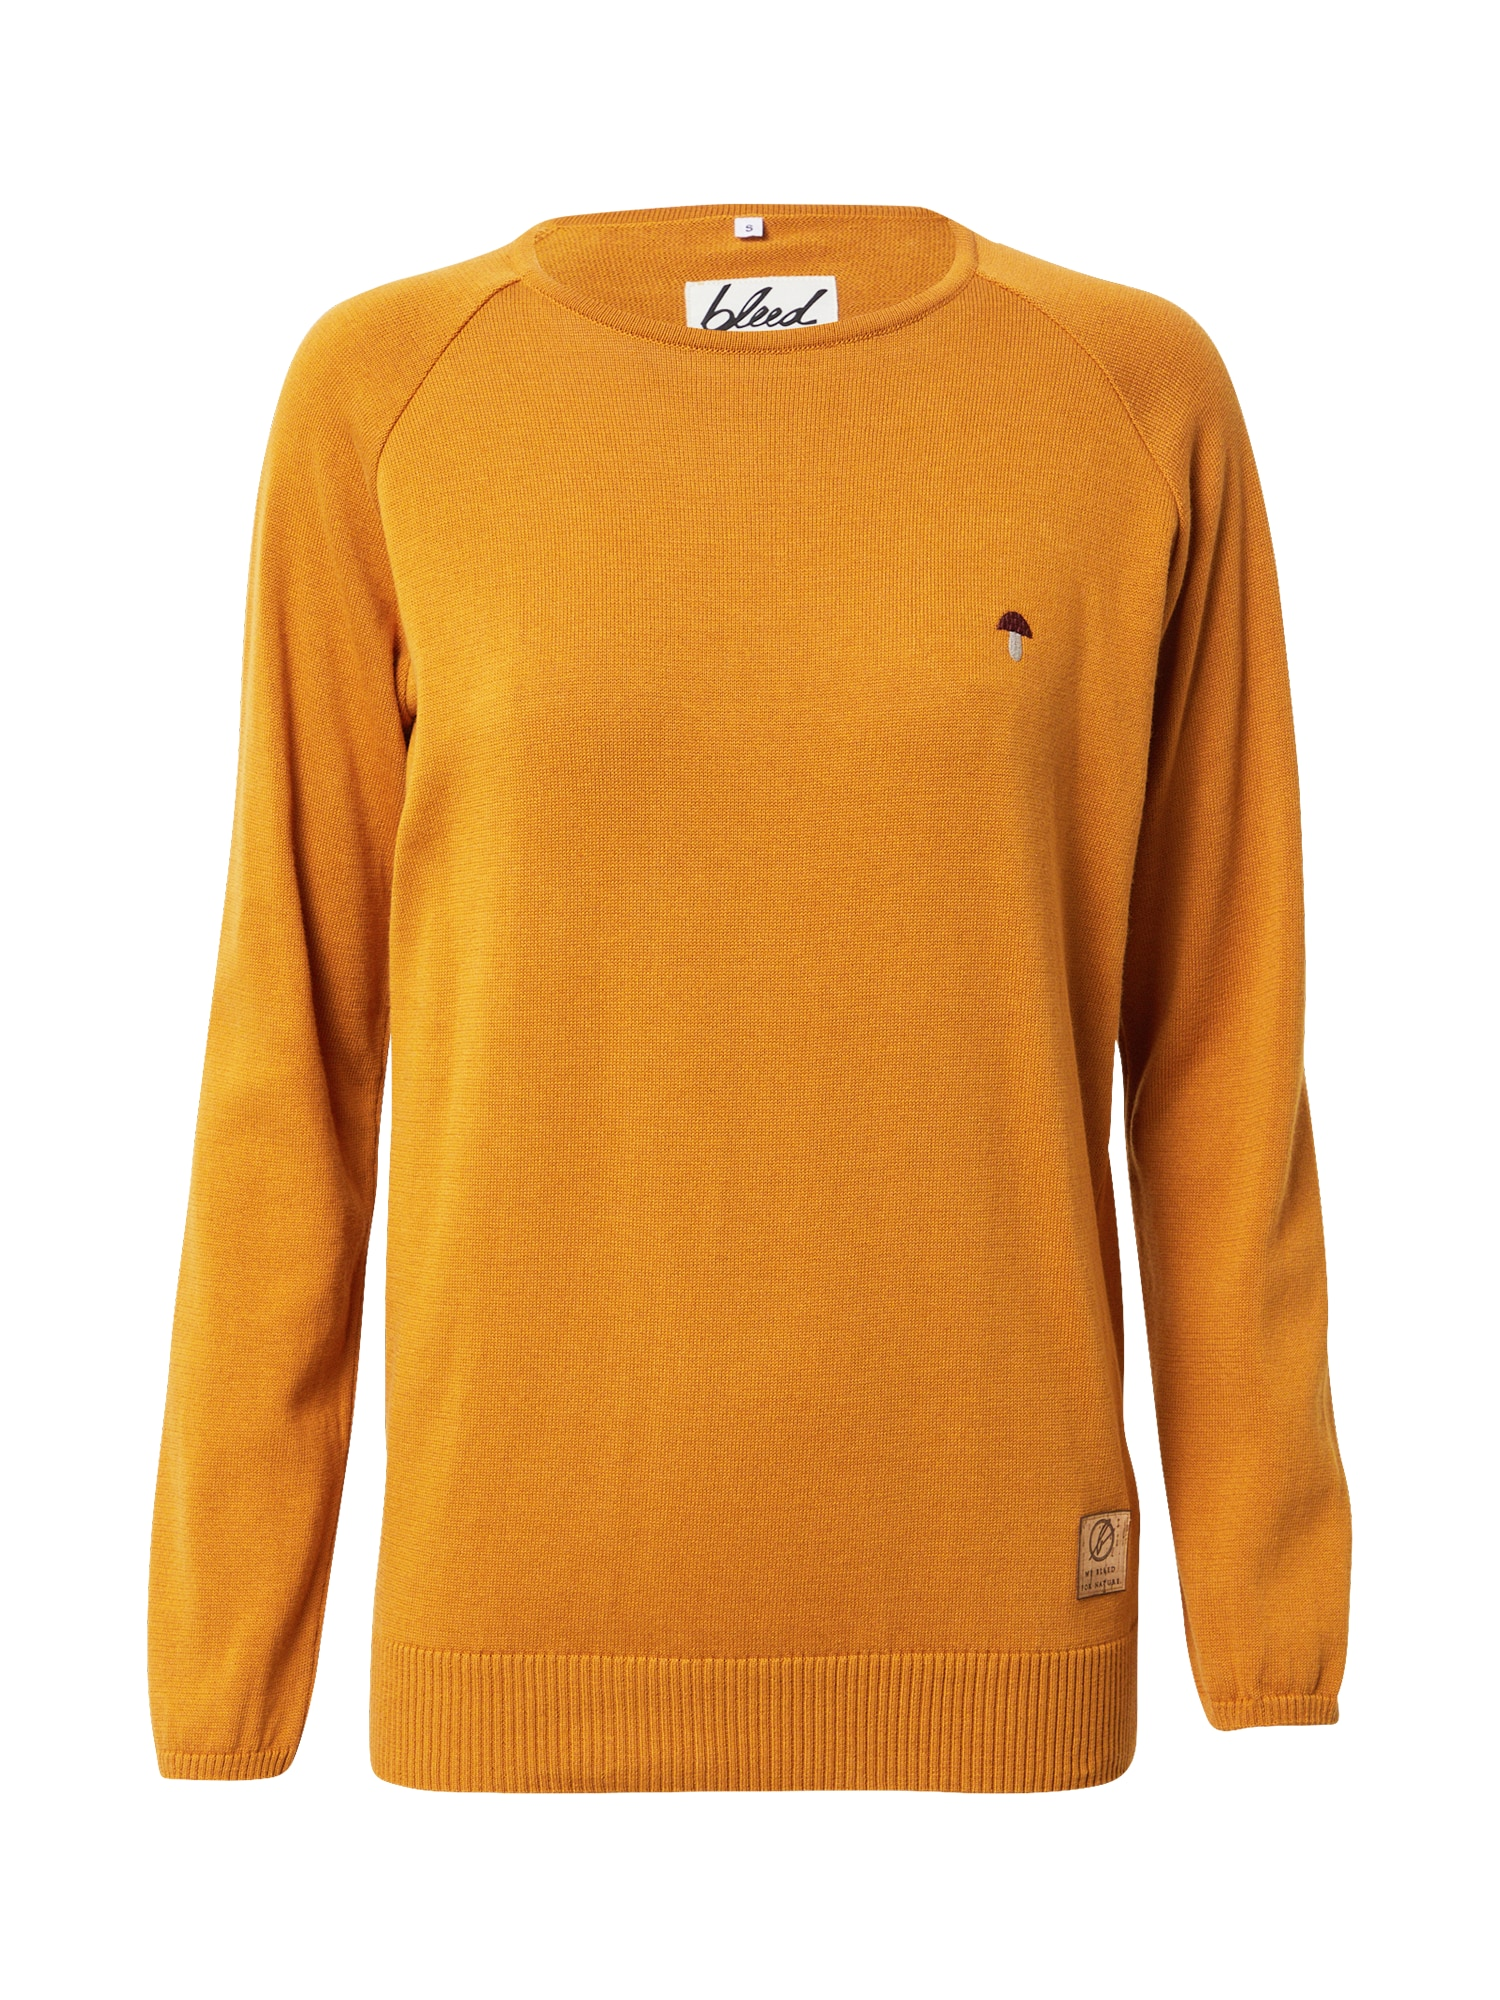 bleed clothing Megztinis tamsiai geltona